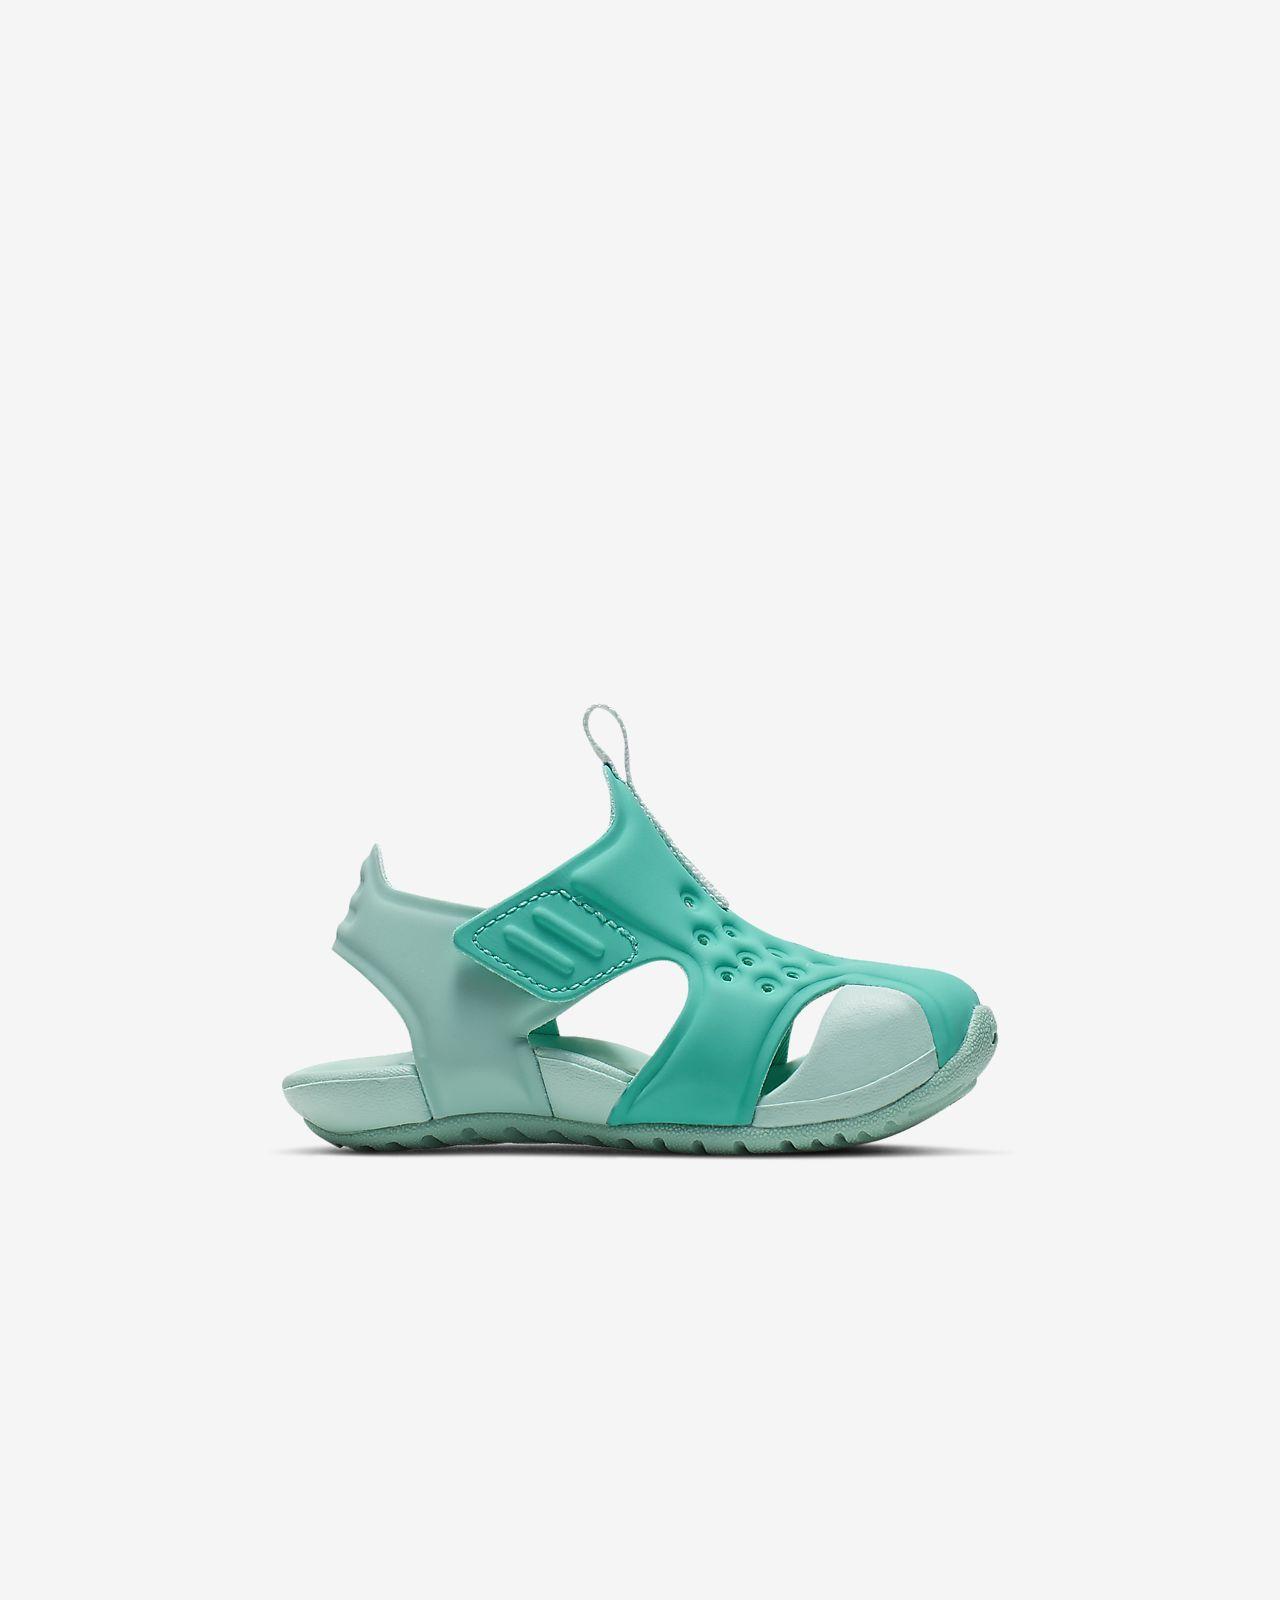 f02f522c99 Sandalia Nike Sunray Protect 2 para bebés   niños pequeños. Nike.com MX